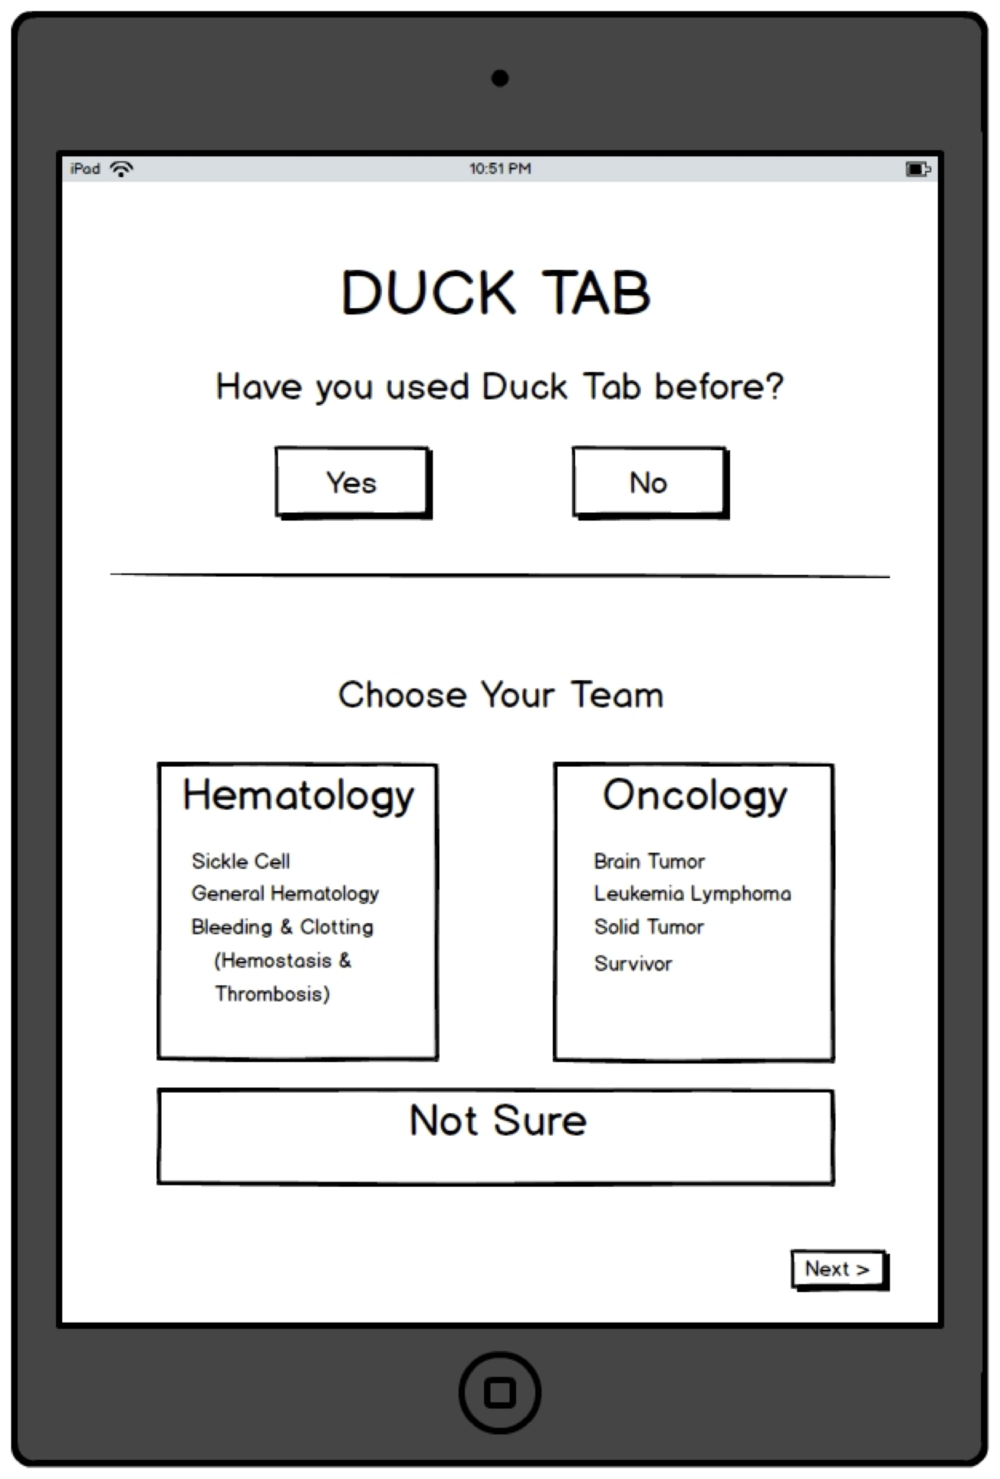 DucktabMockup_2.png